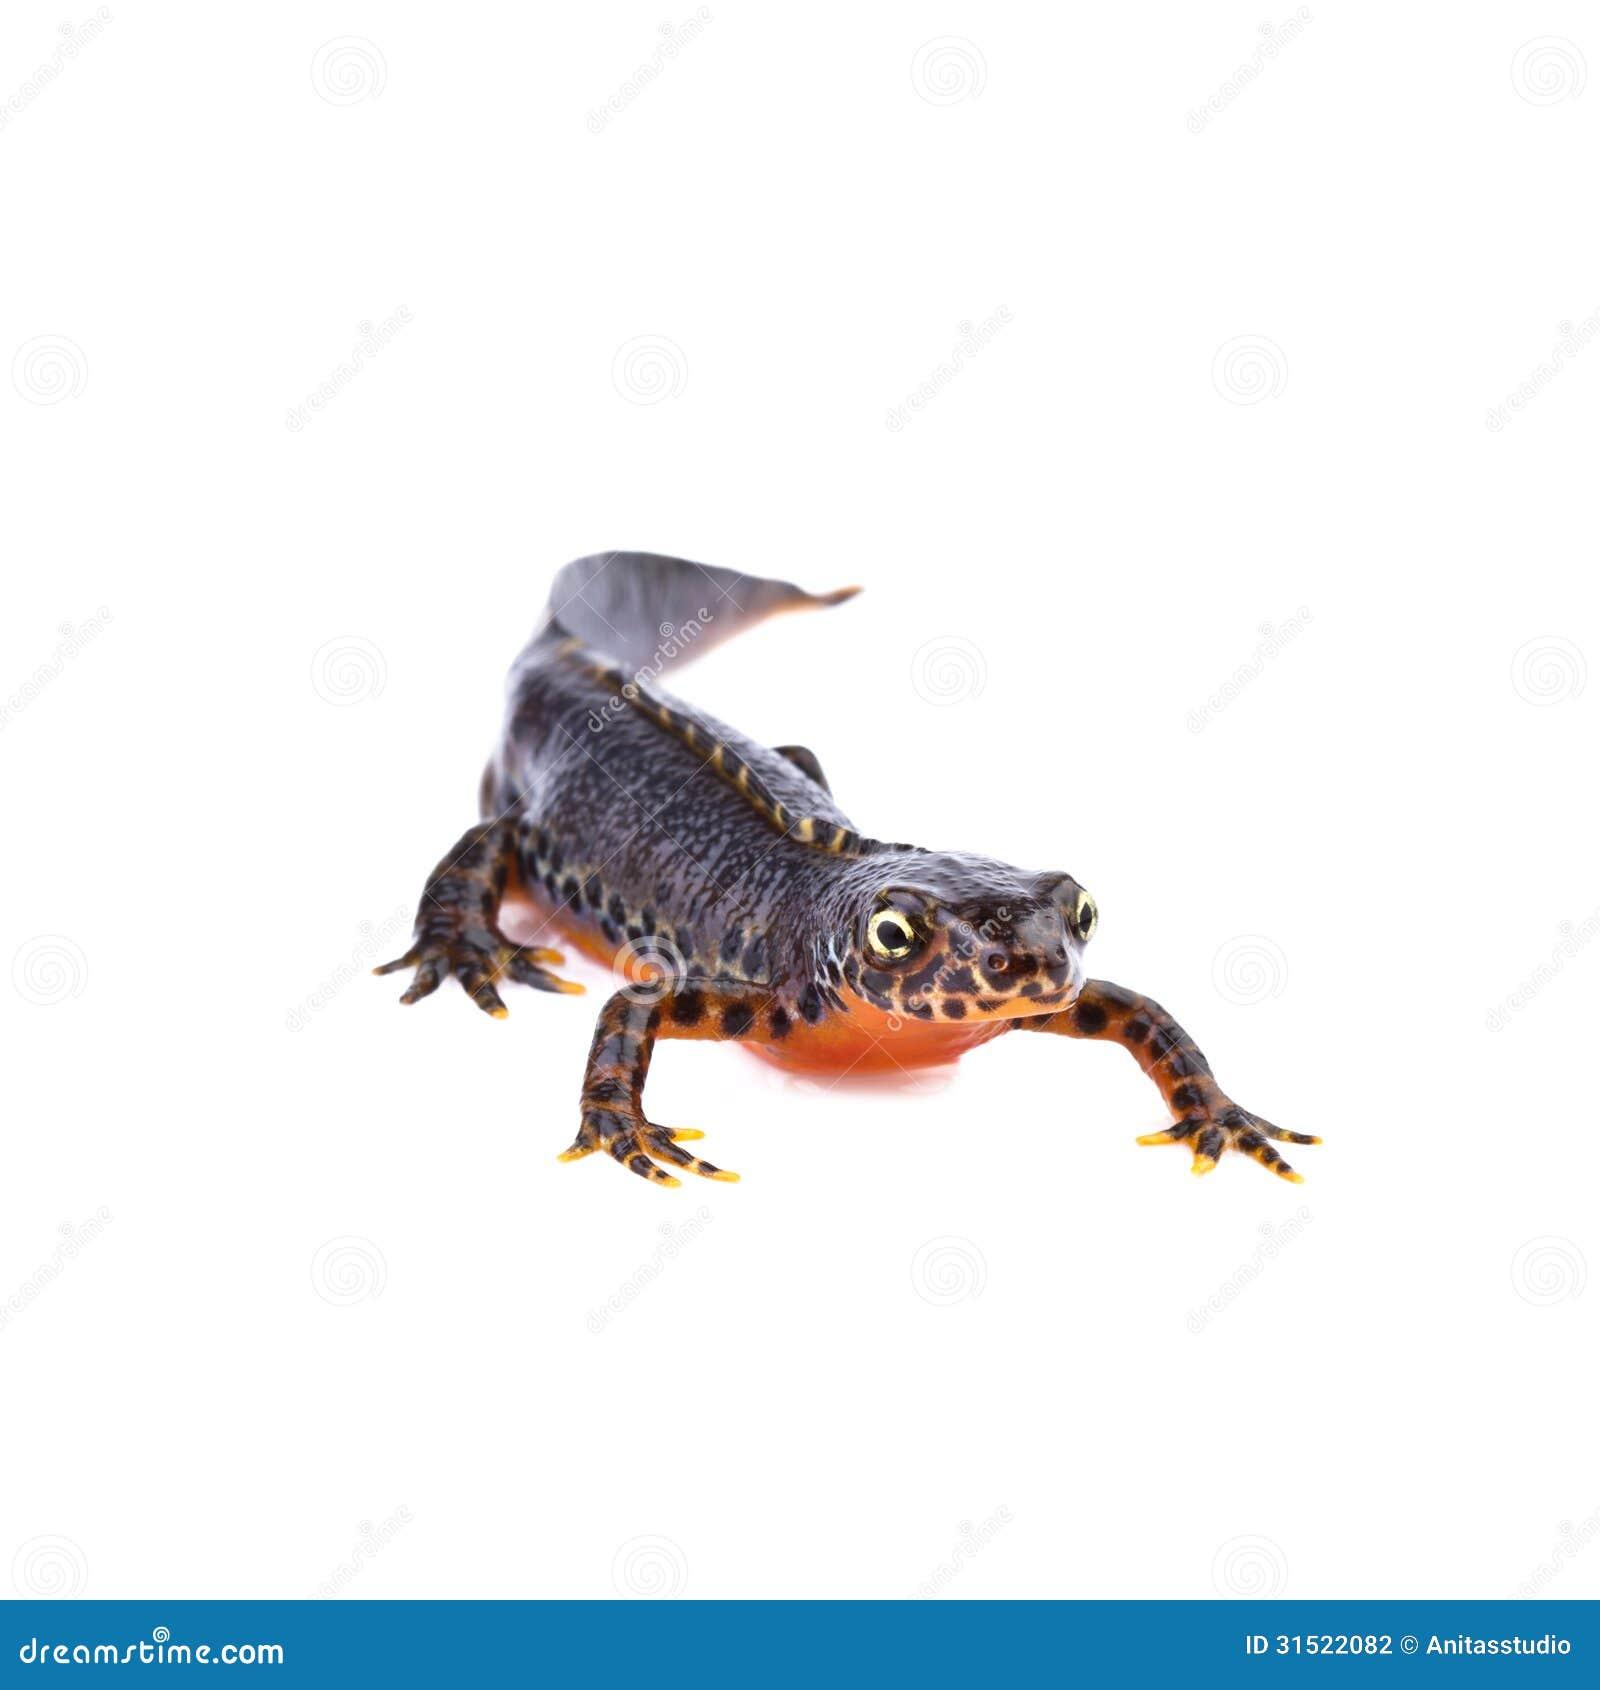 salamander white background - photo #21